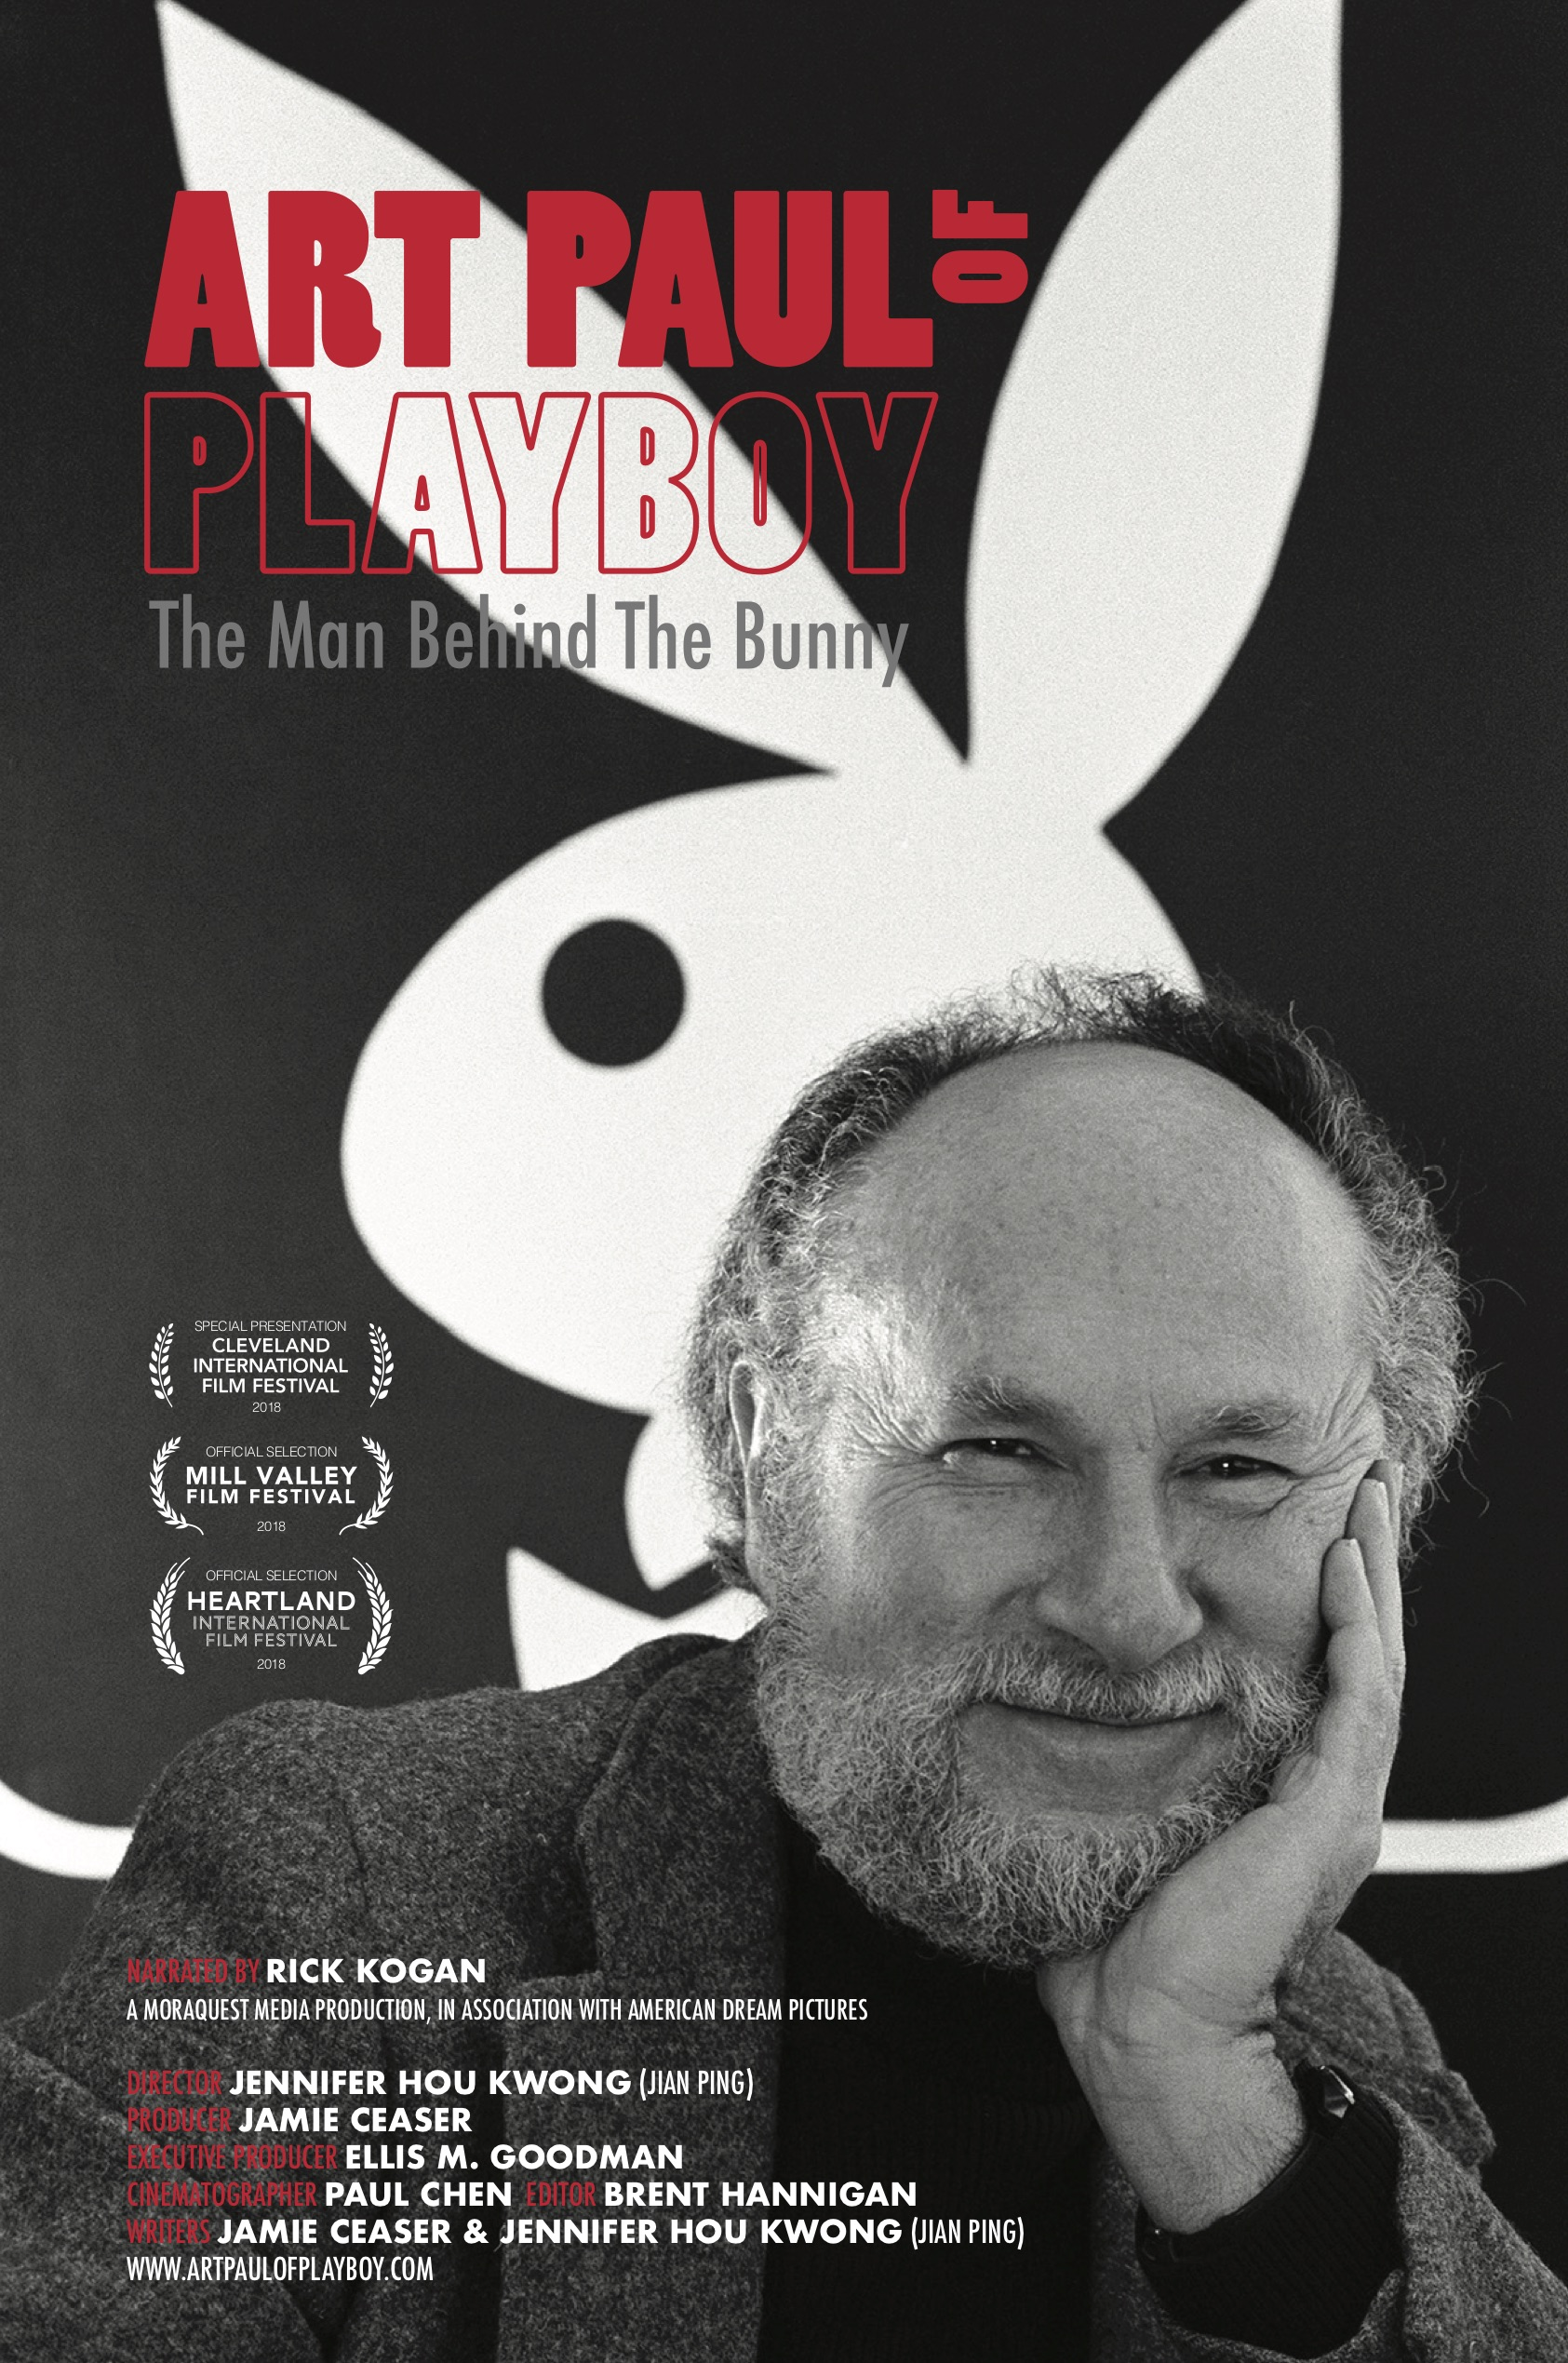 ArtPaulofPlayboy_poster.jpg